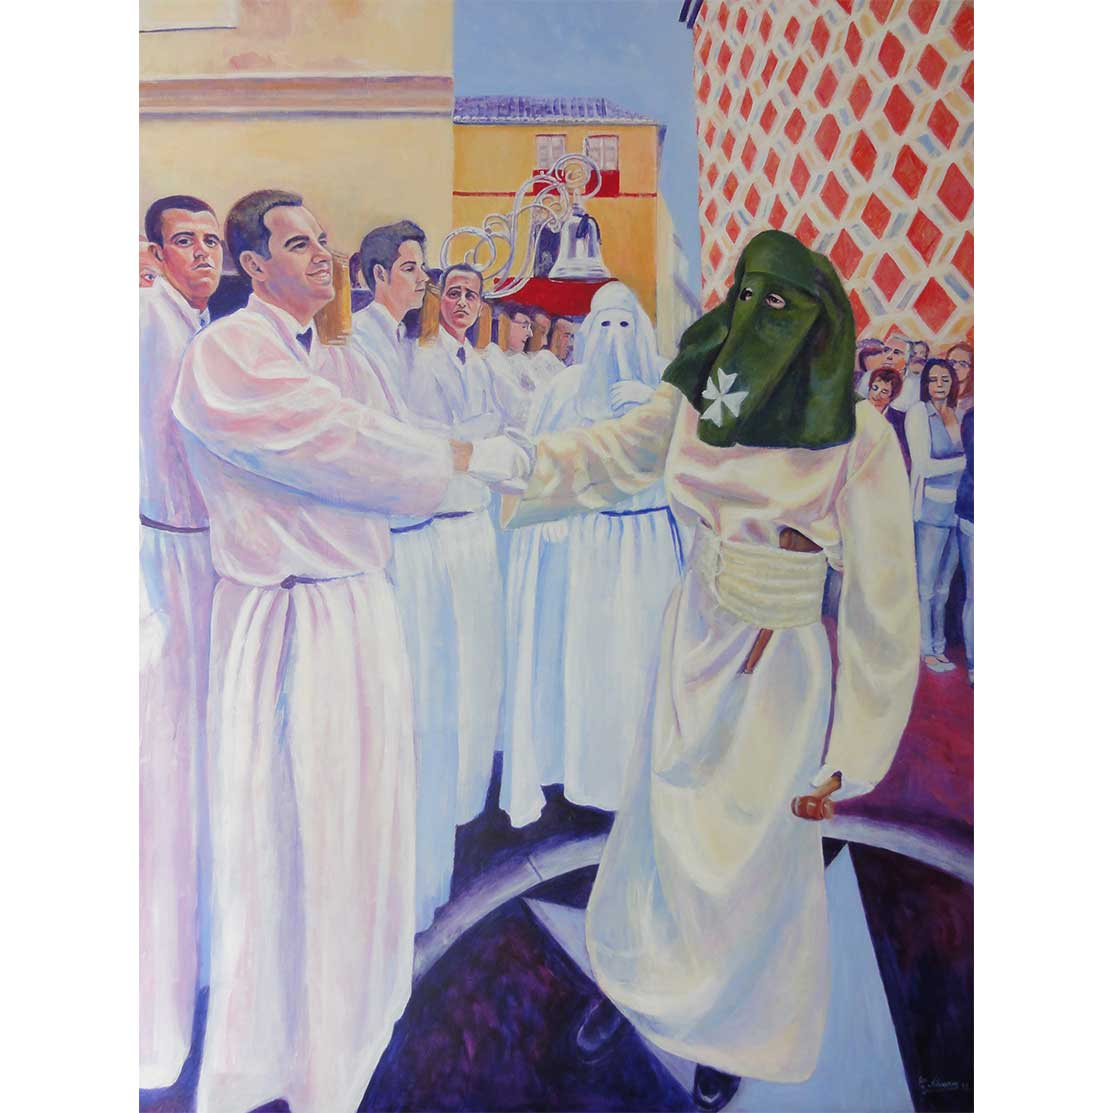 RECEPTION OF BANDERAS Acrylic on panel 100 x 75 cm